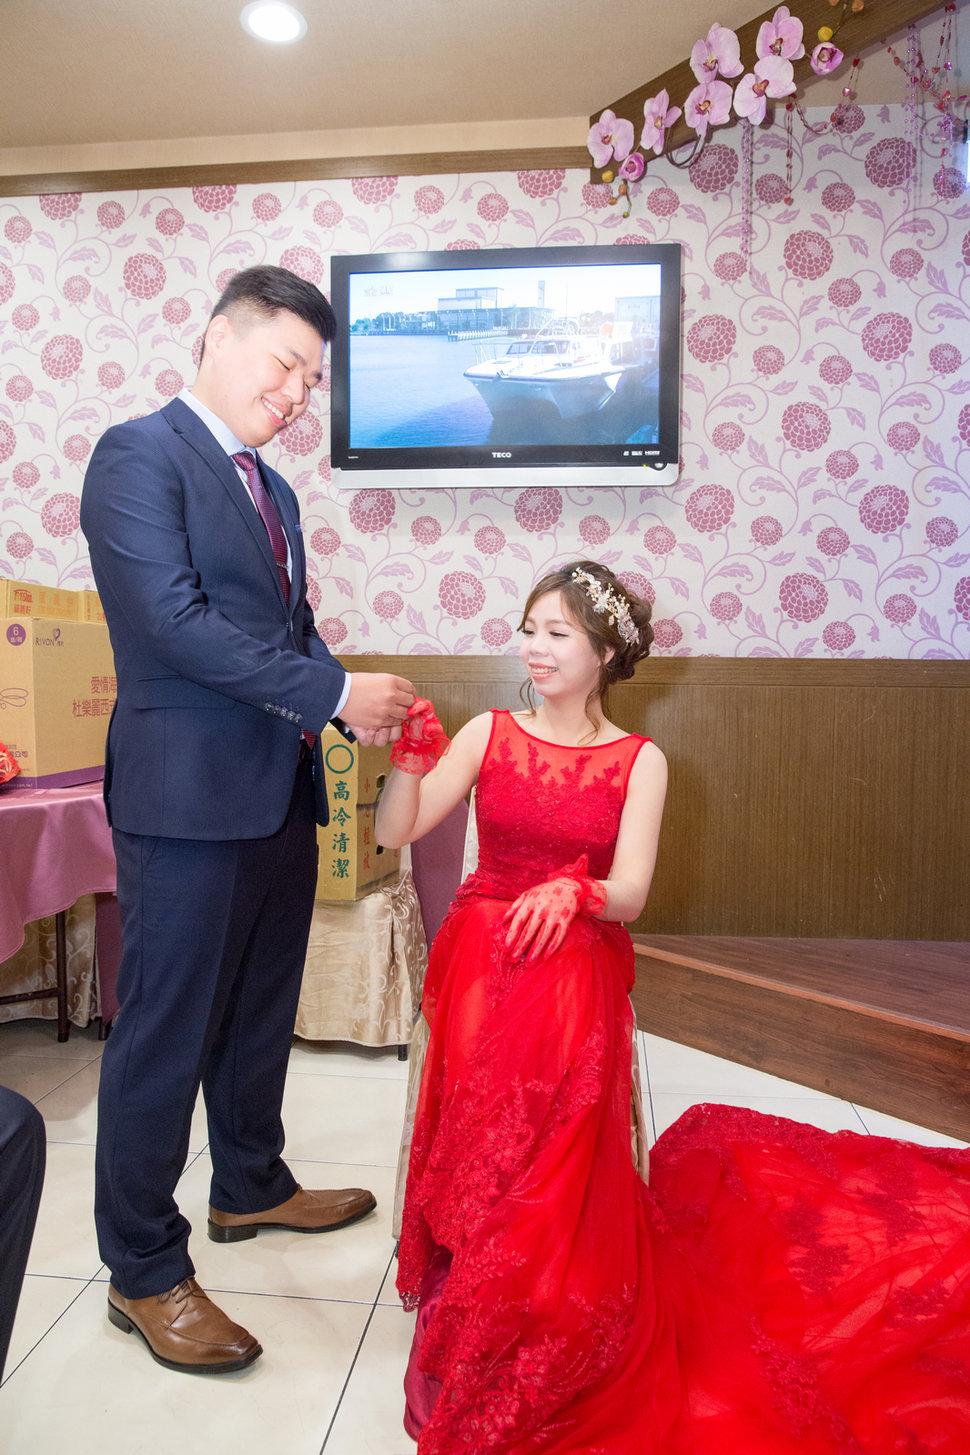 HANK9545 - 蛋拔婚禮紀錄 - 結婚吧